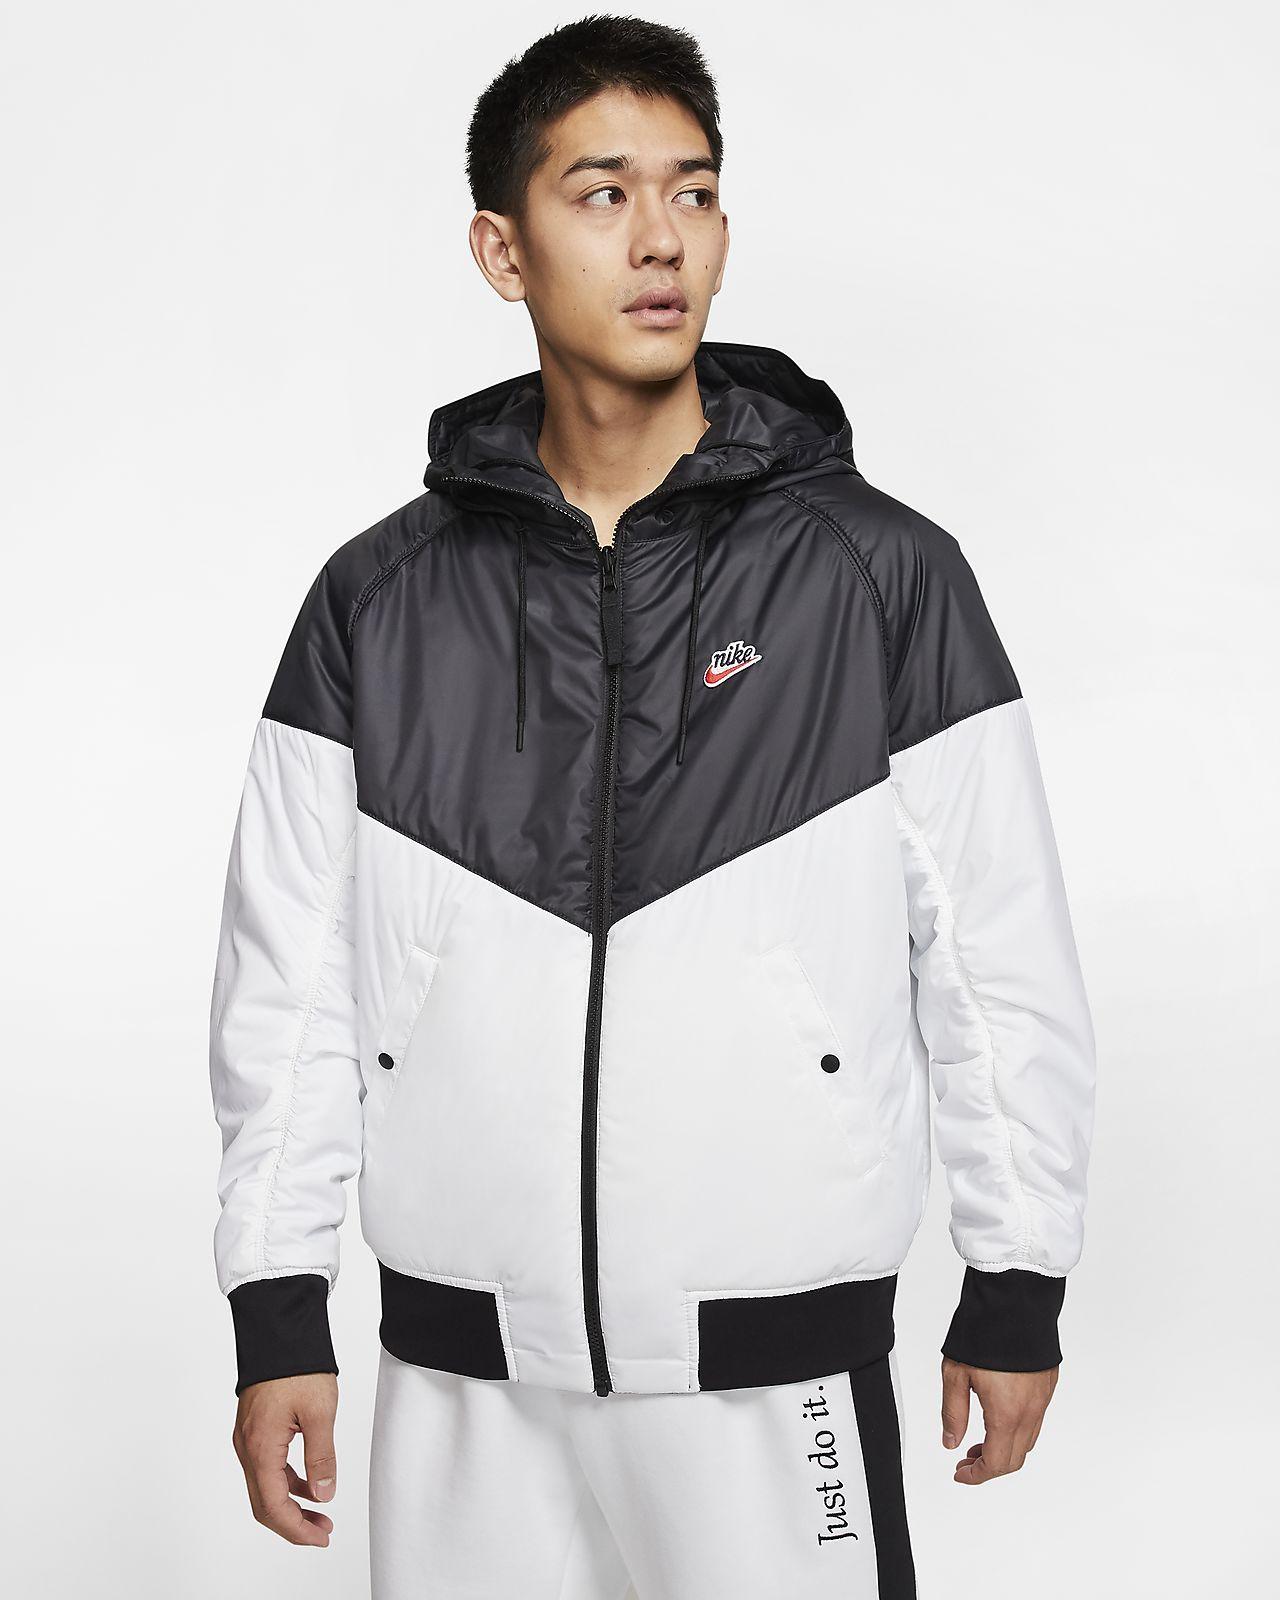 Predownload: Nike Sportswear Windrunner Men S Reversible Hooded Jacket Nike Ca Nike Clothes Mens Mens Jacket Black Nike Sportswear [ 1600 x 1280 Pixel ]